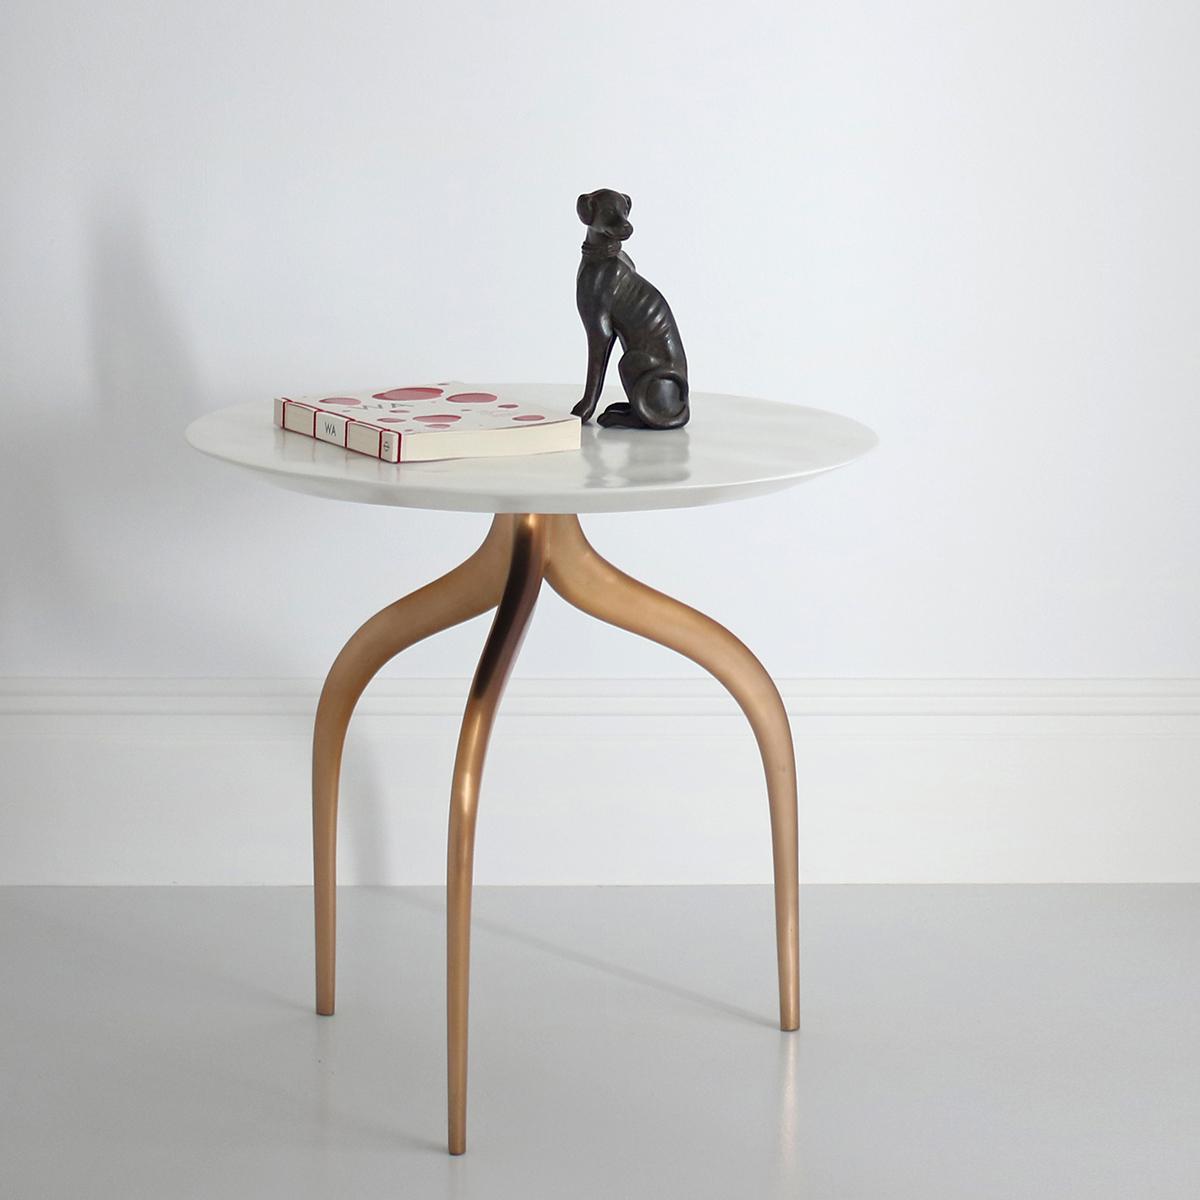 LARGE BRONZE SEA TABLE £4,800